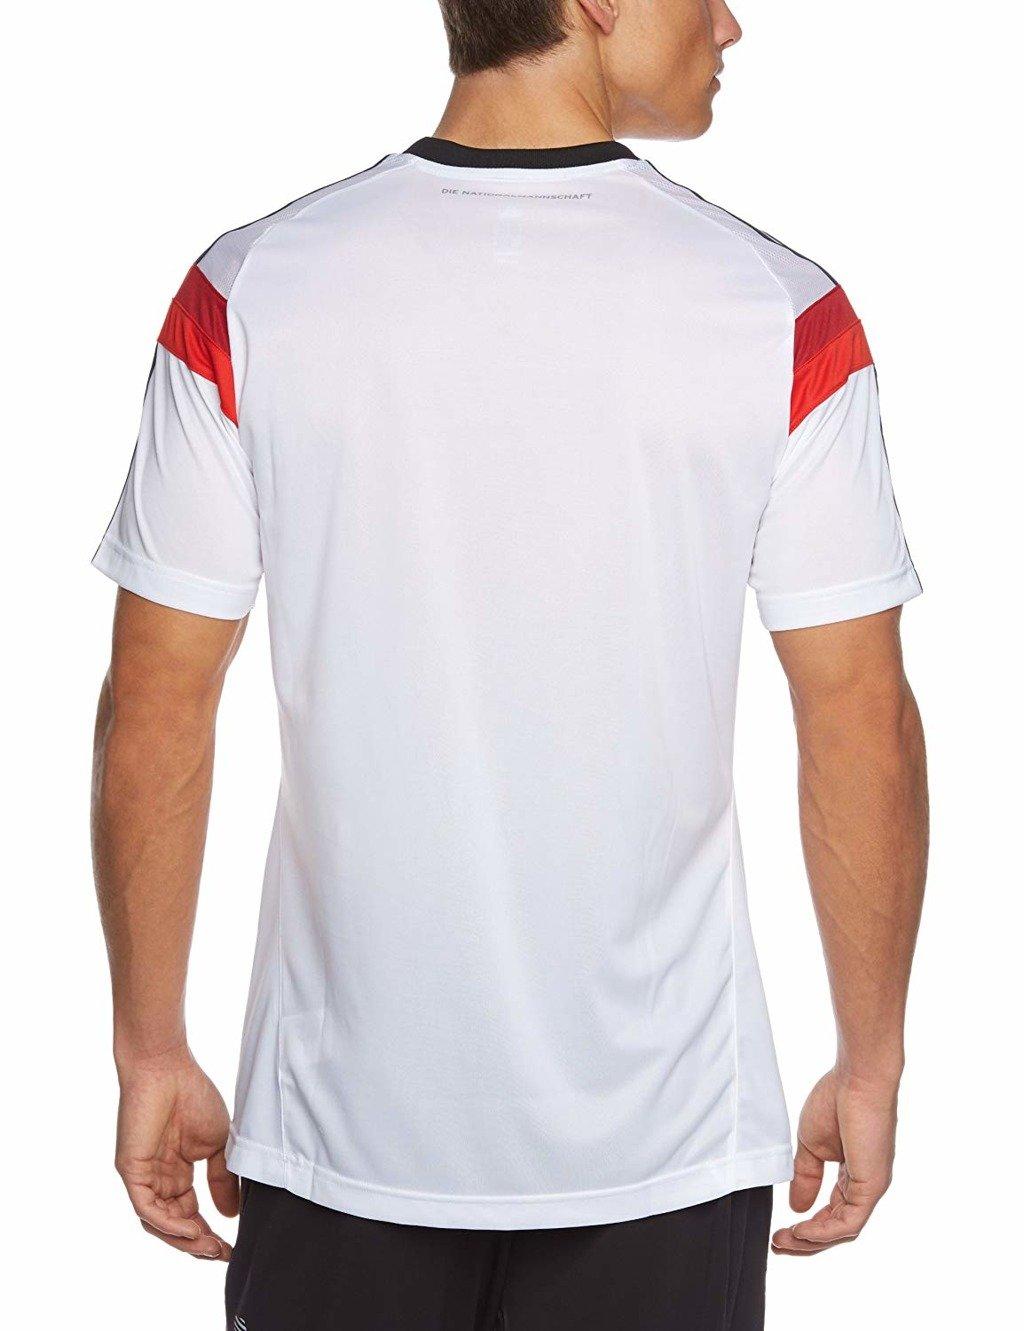 128a7be03809 Koszulka Reprezentacji Niemiec adidas - D83064 ...